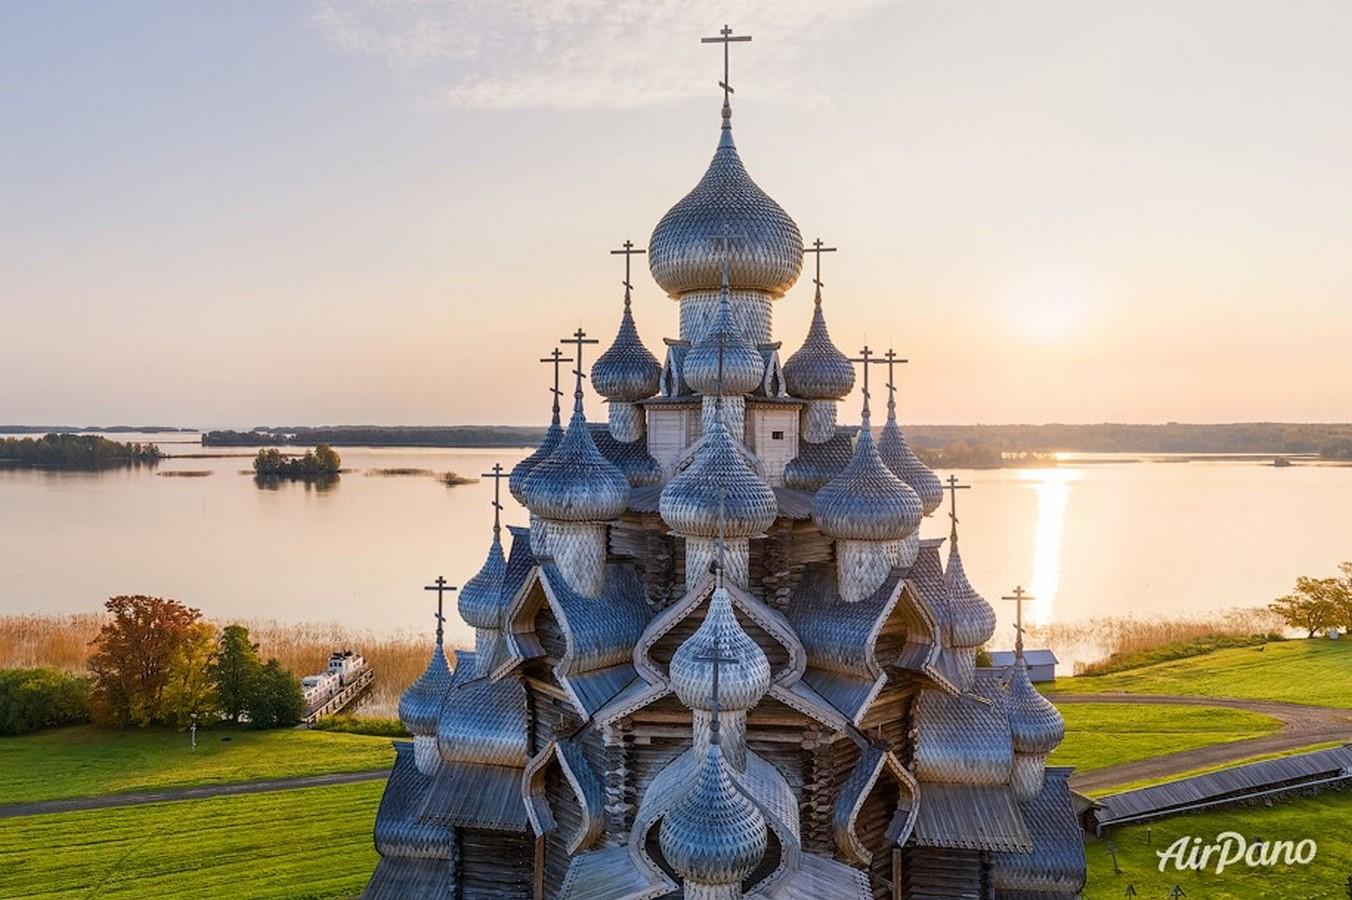 Wooden Architecture of Kizhi Island, Russia - Sheet4